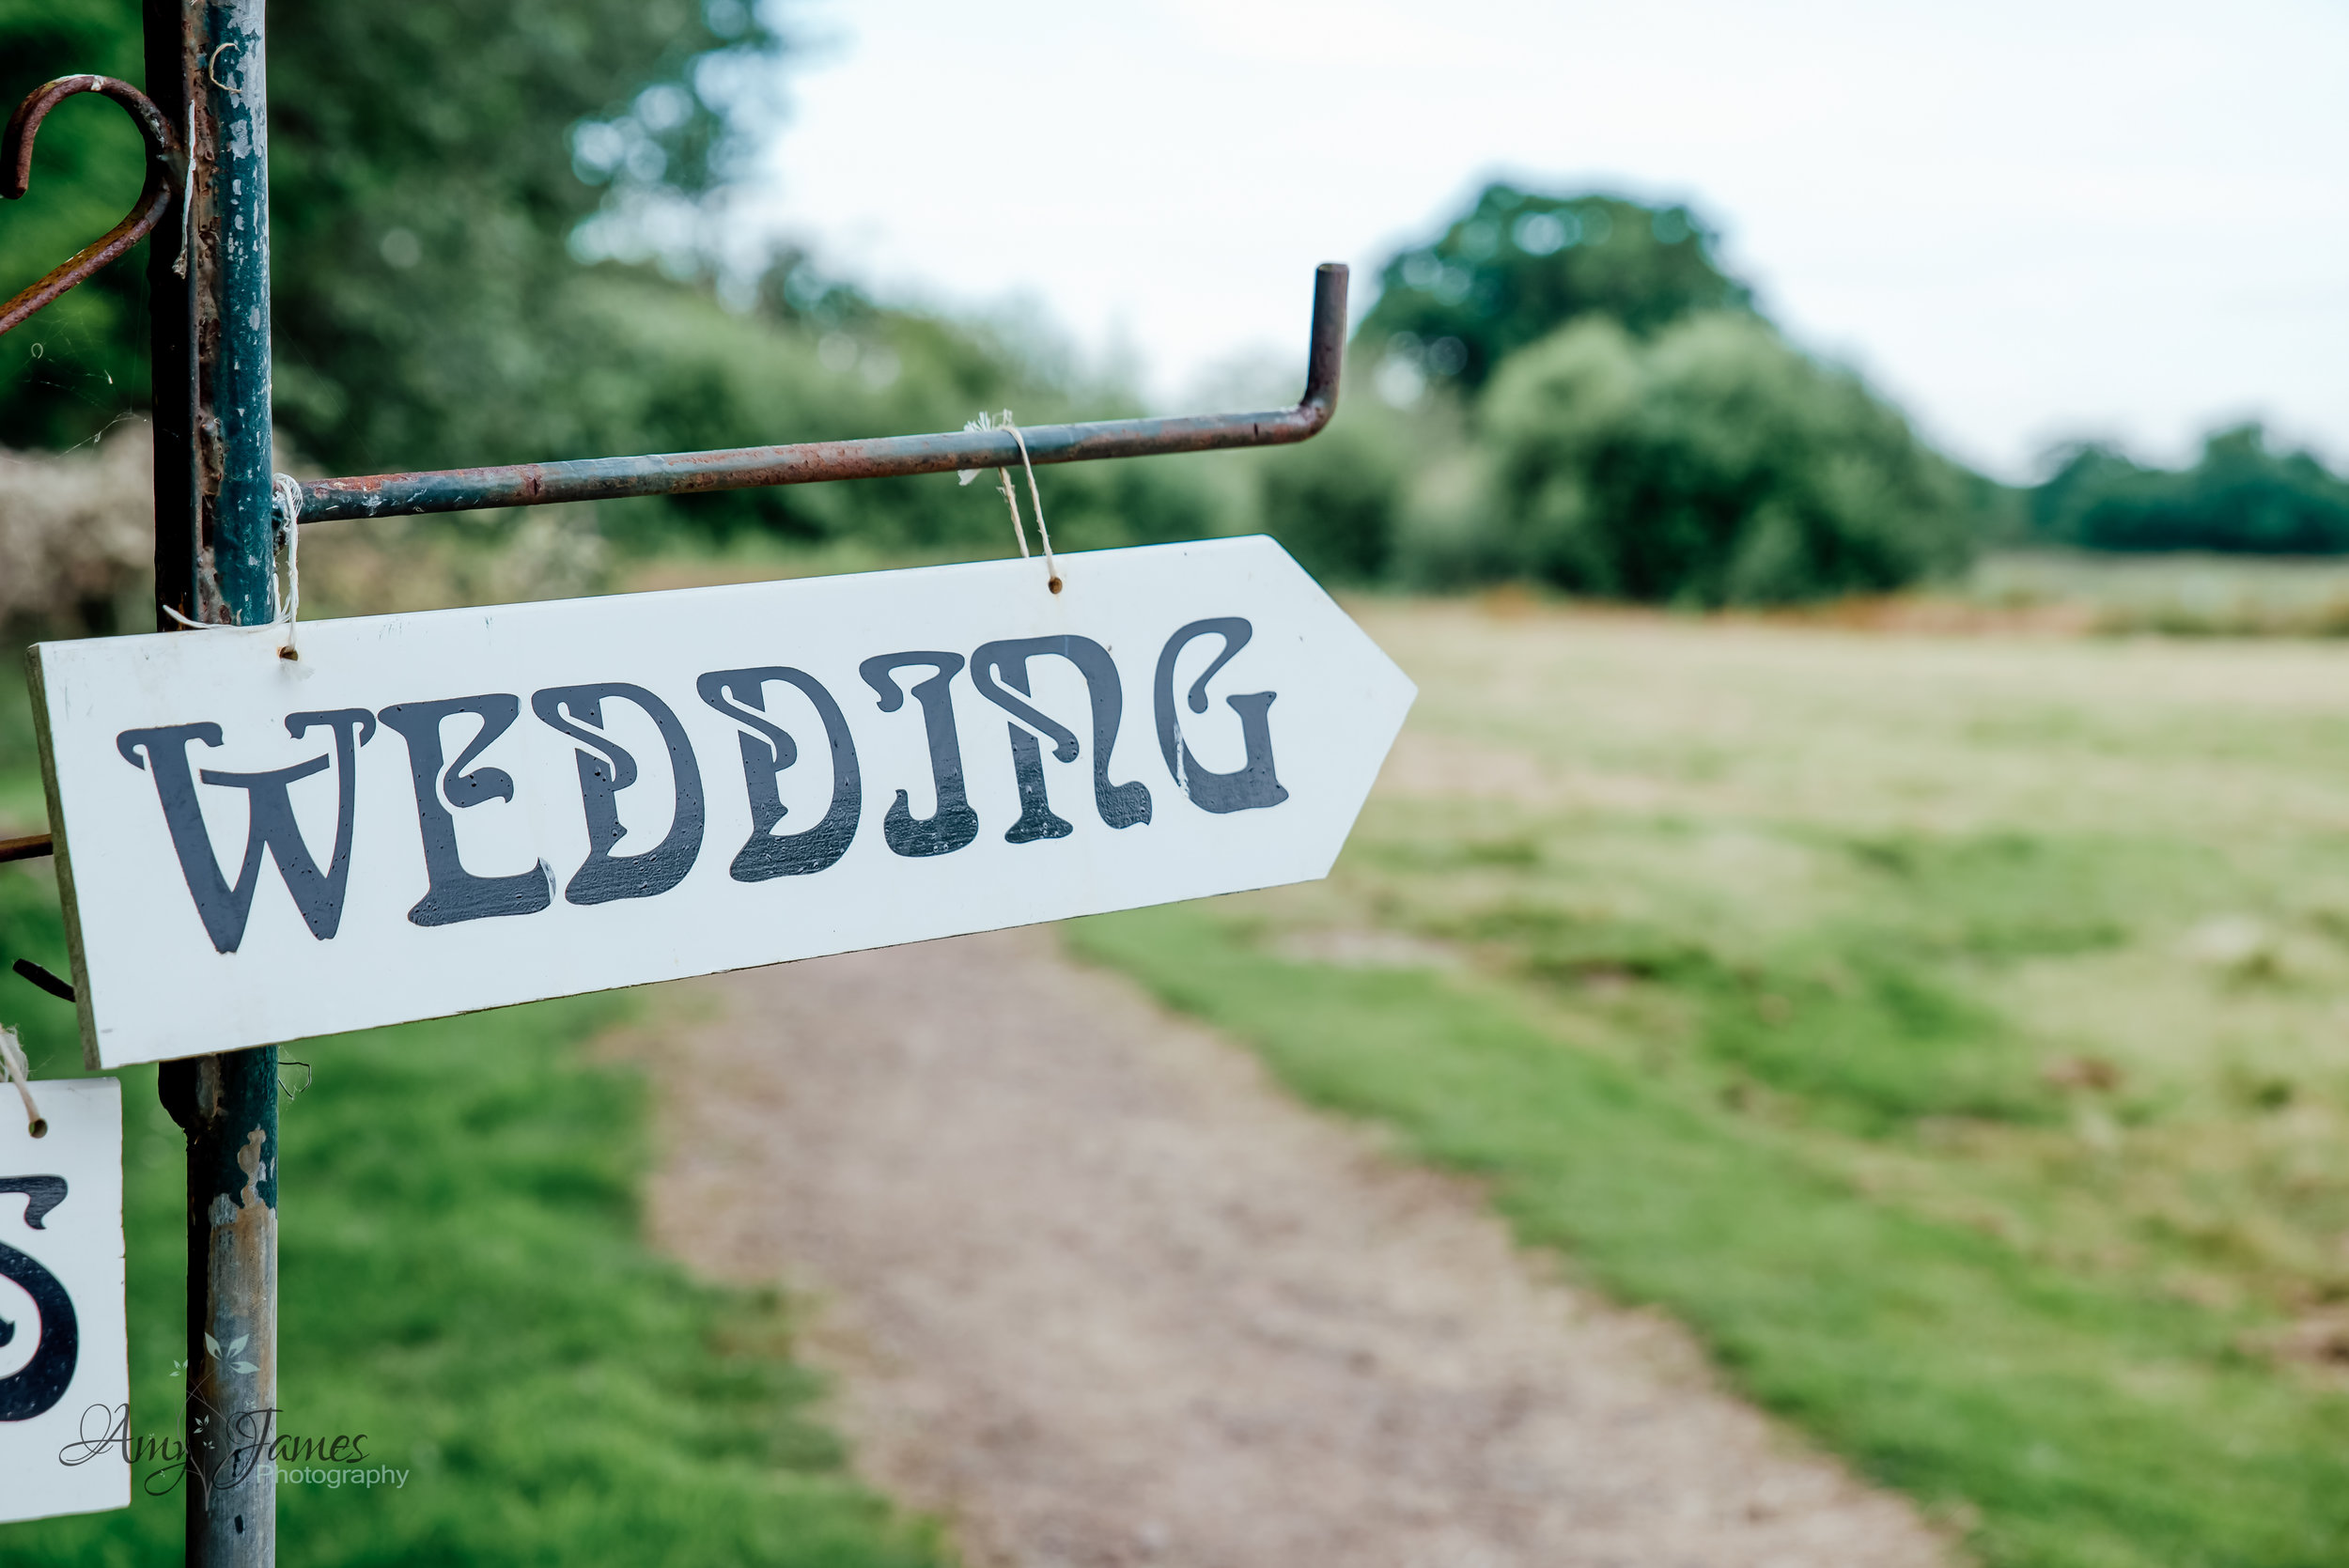 Wedding sign - outdoor wedding ceremony - Amy James Photography - Wedding photographer - Hampshire